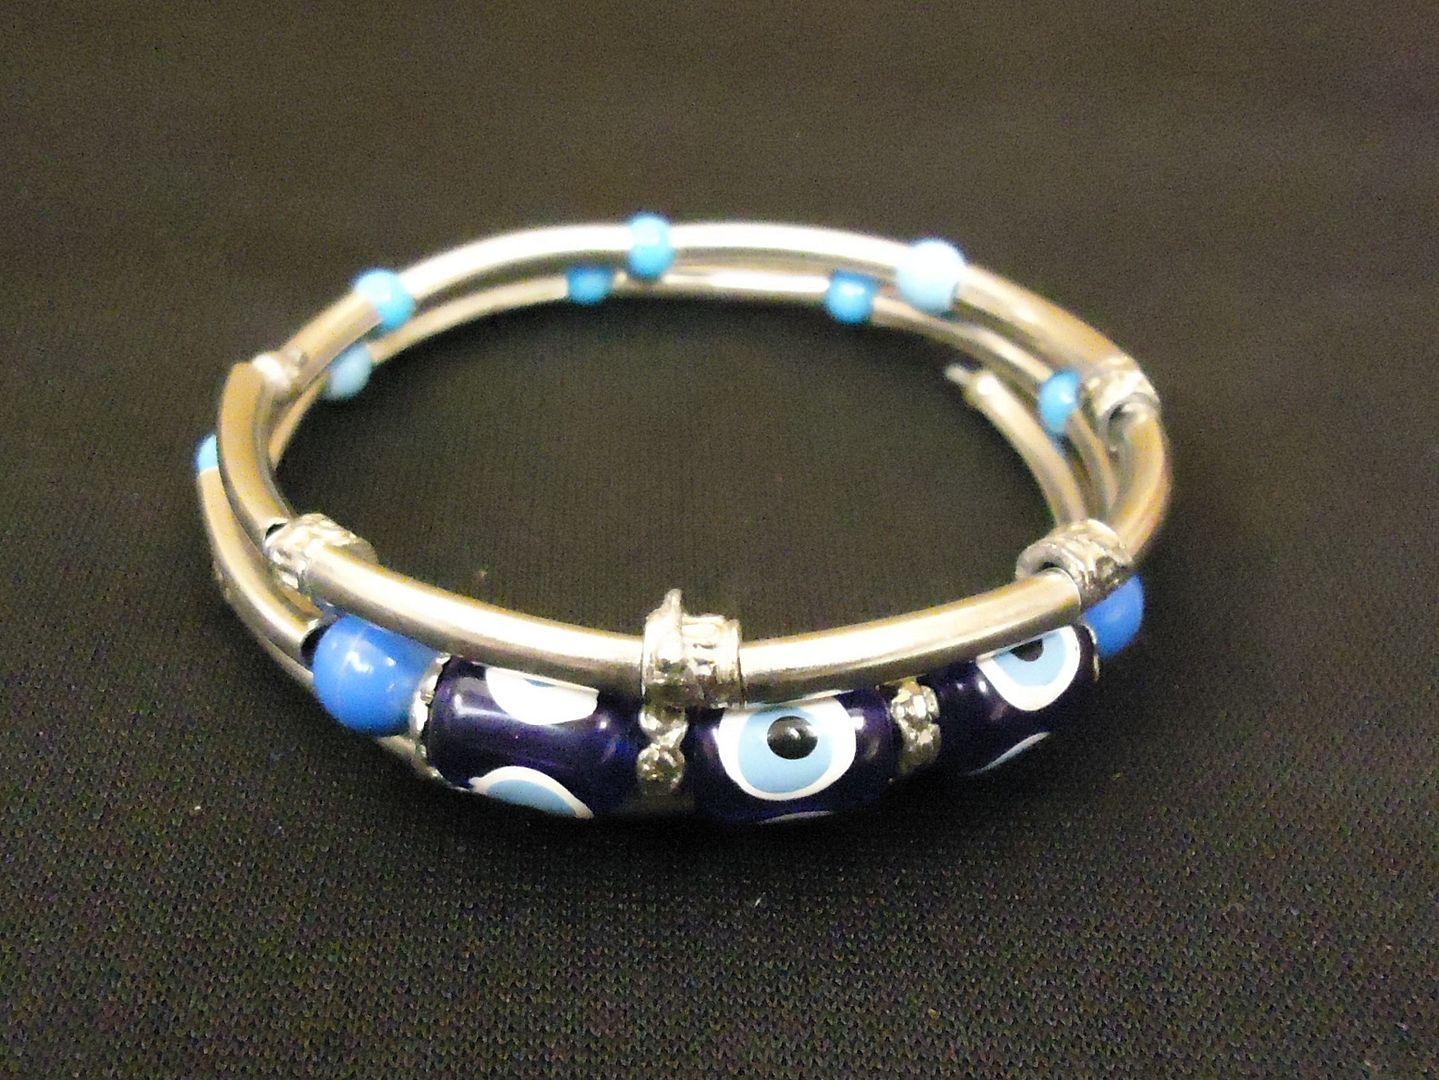 lm7410 112712-544n Designer Fashion Bracelet Bangle Metal Stones Female Adult Silvers/Blues